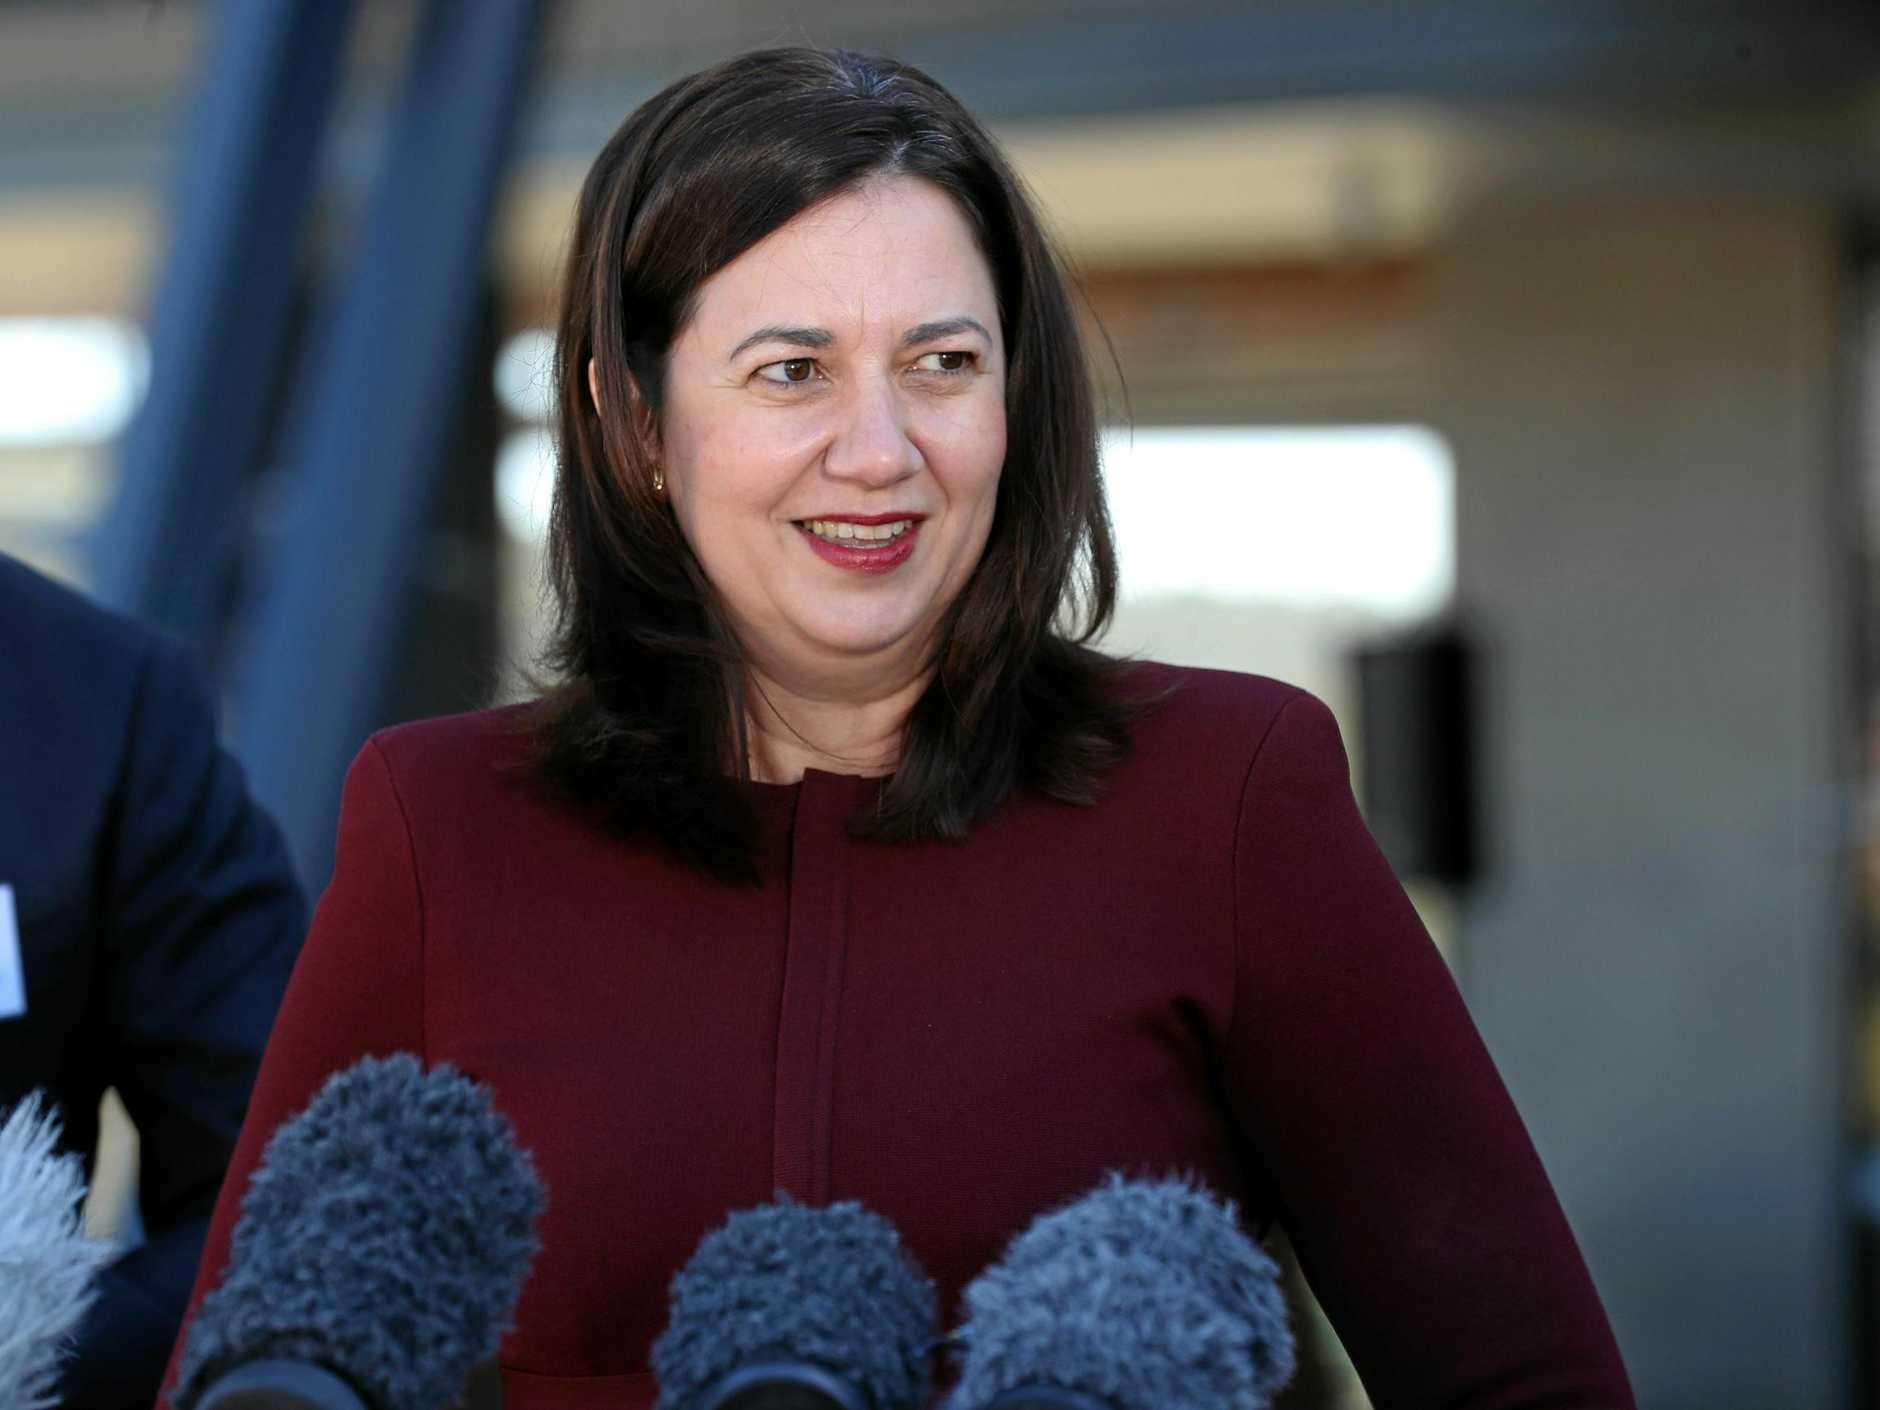 POLITICAL LUNCH: Premier Annastacia Palaszczuk will visit Rockhampton for a business lunch.